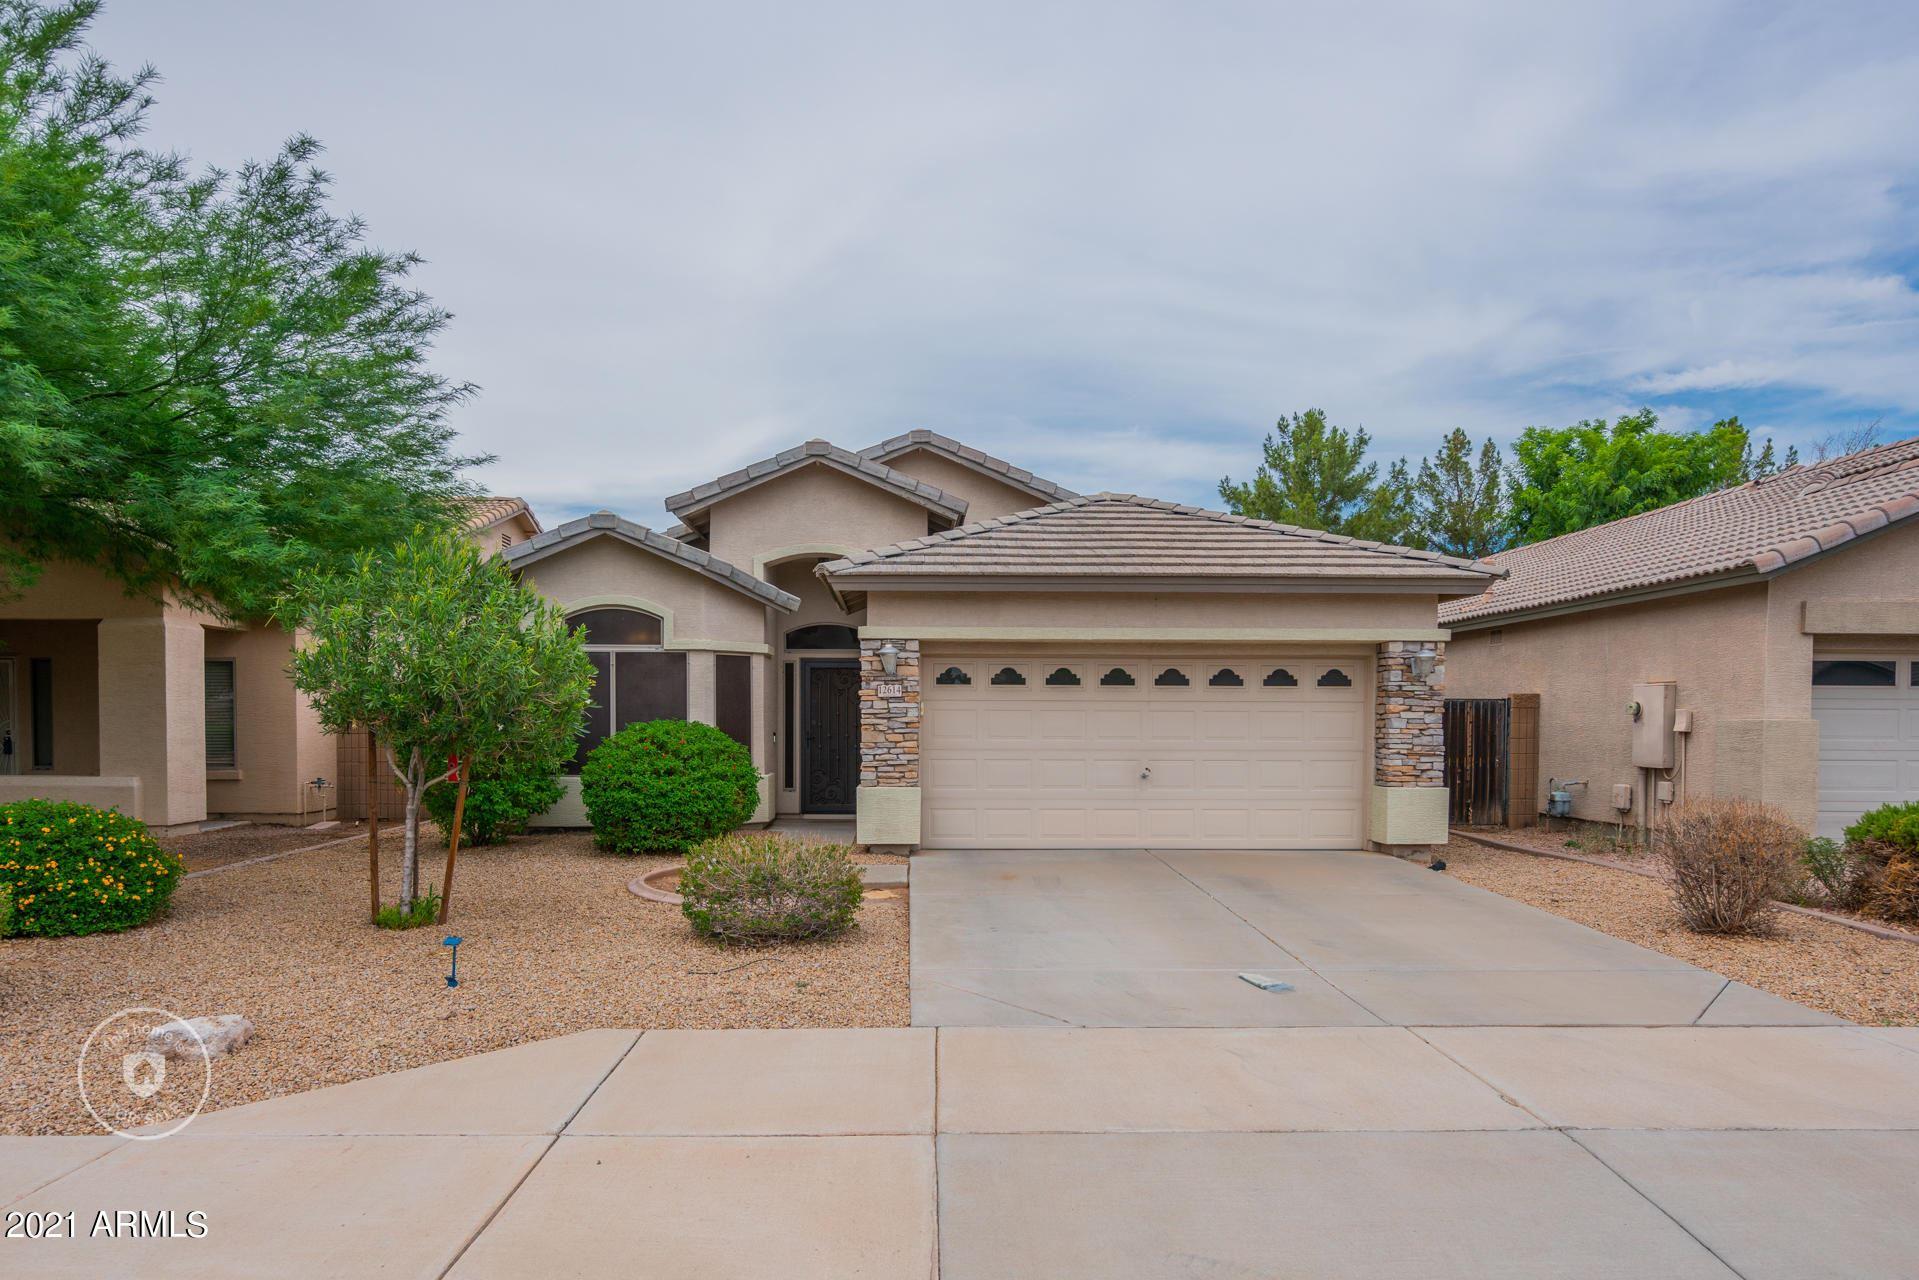 Photo of 12614 W REDONDO Drive, Litchfield Park, AZ 85340 (MLS # 6268526)